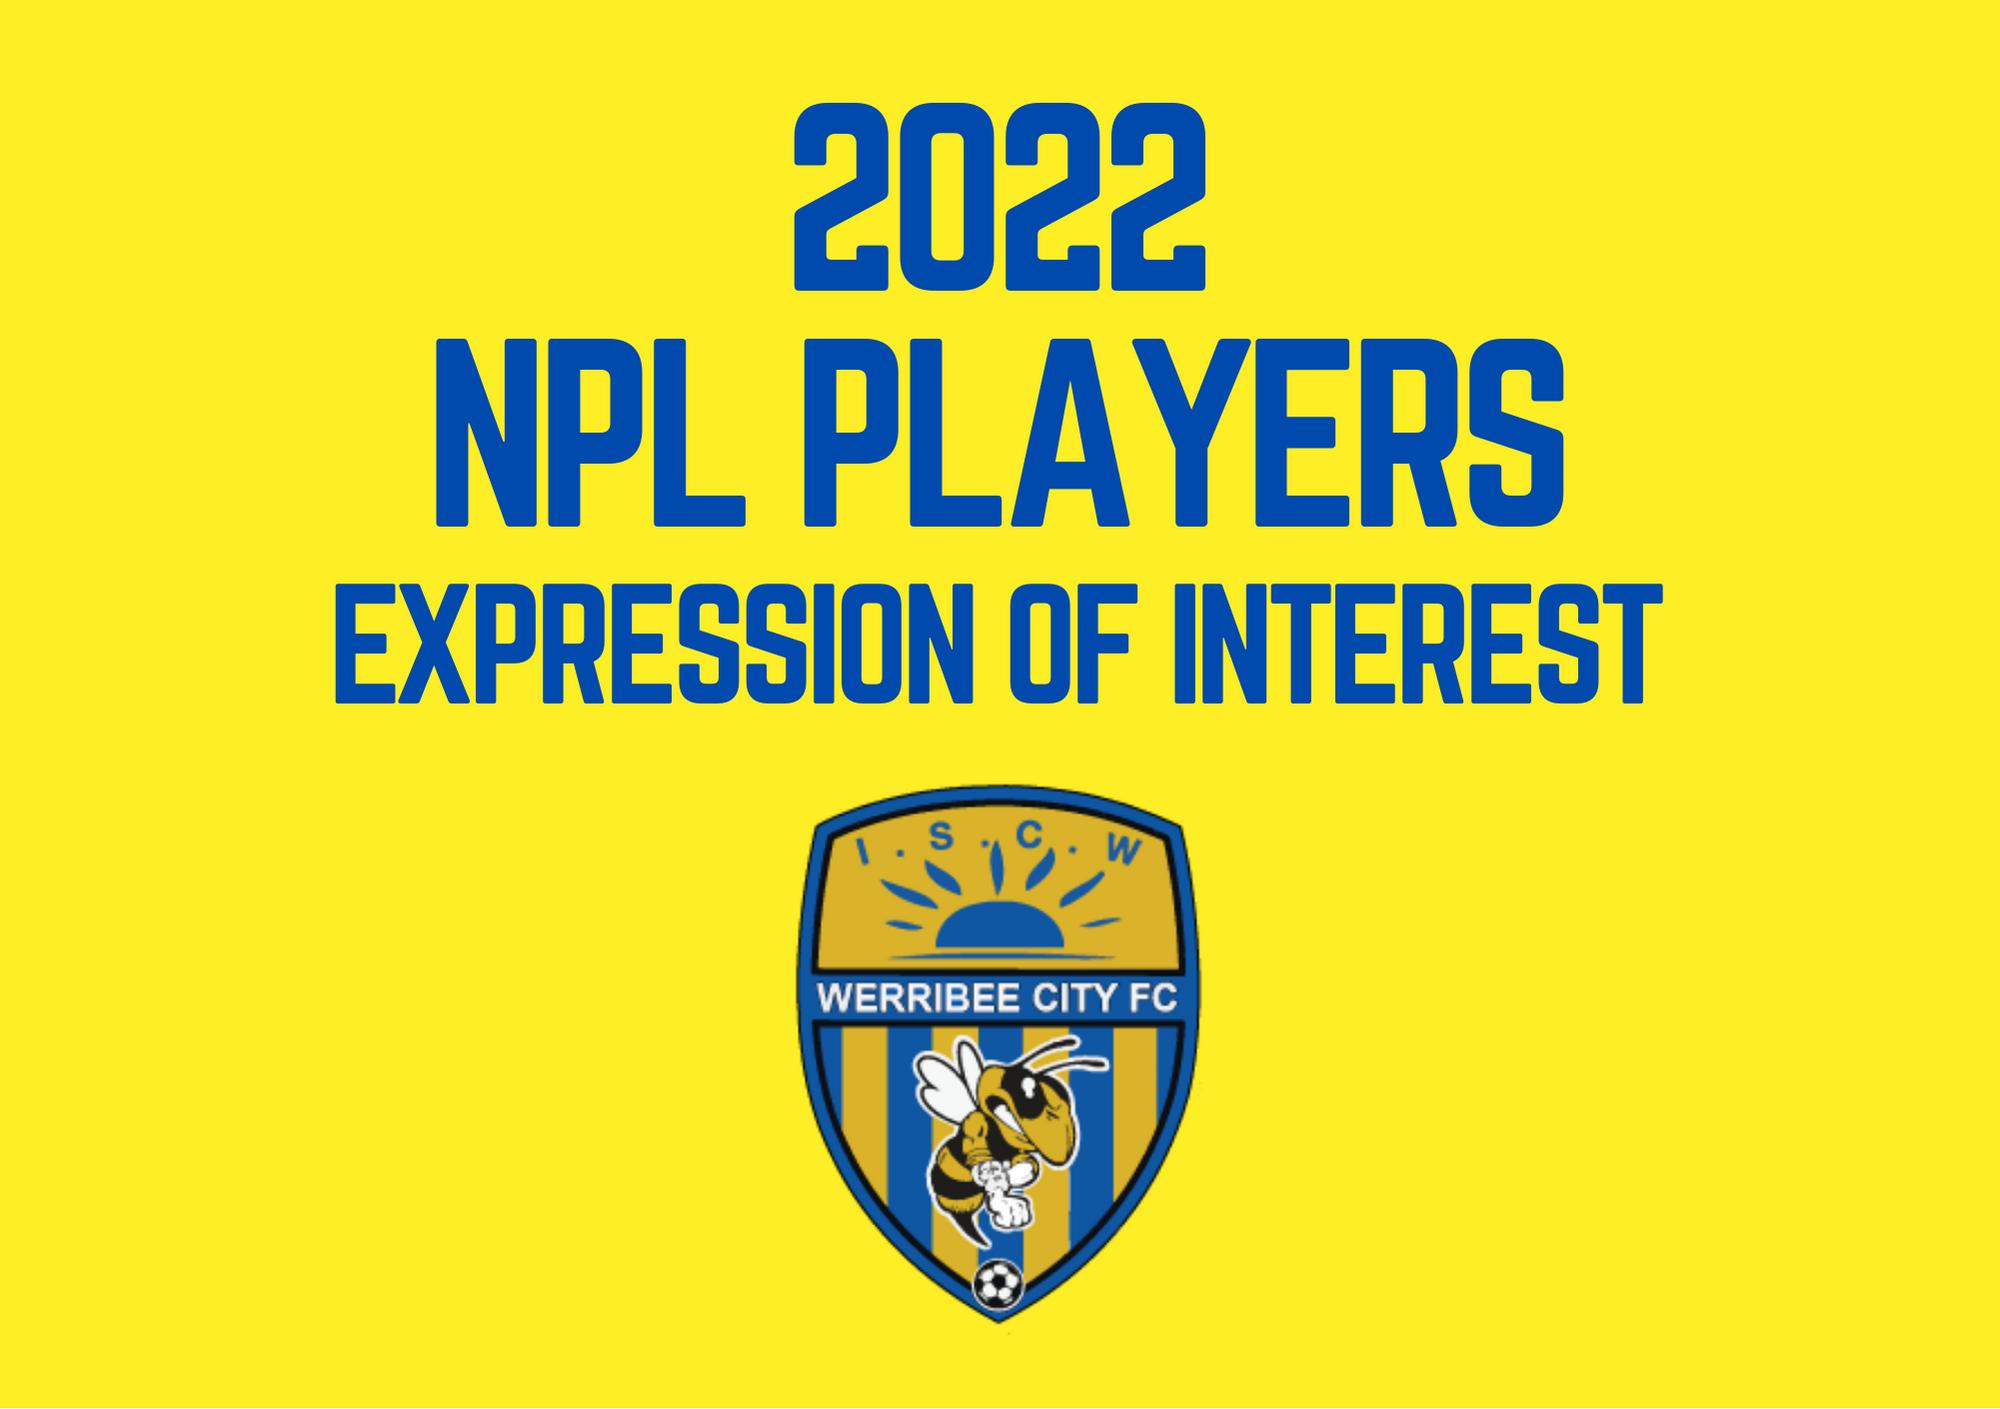 A5 NPL PLAYERS 2022